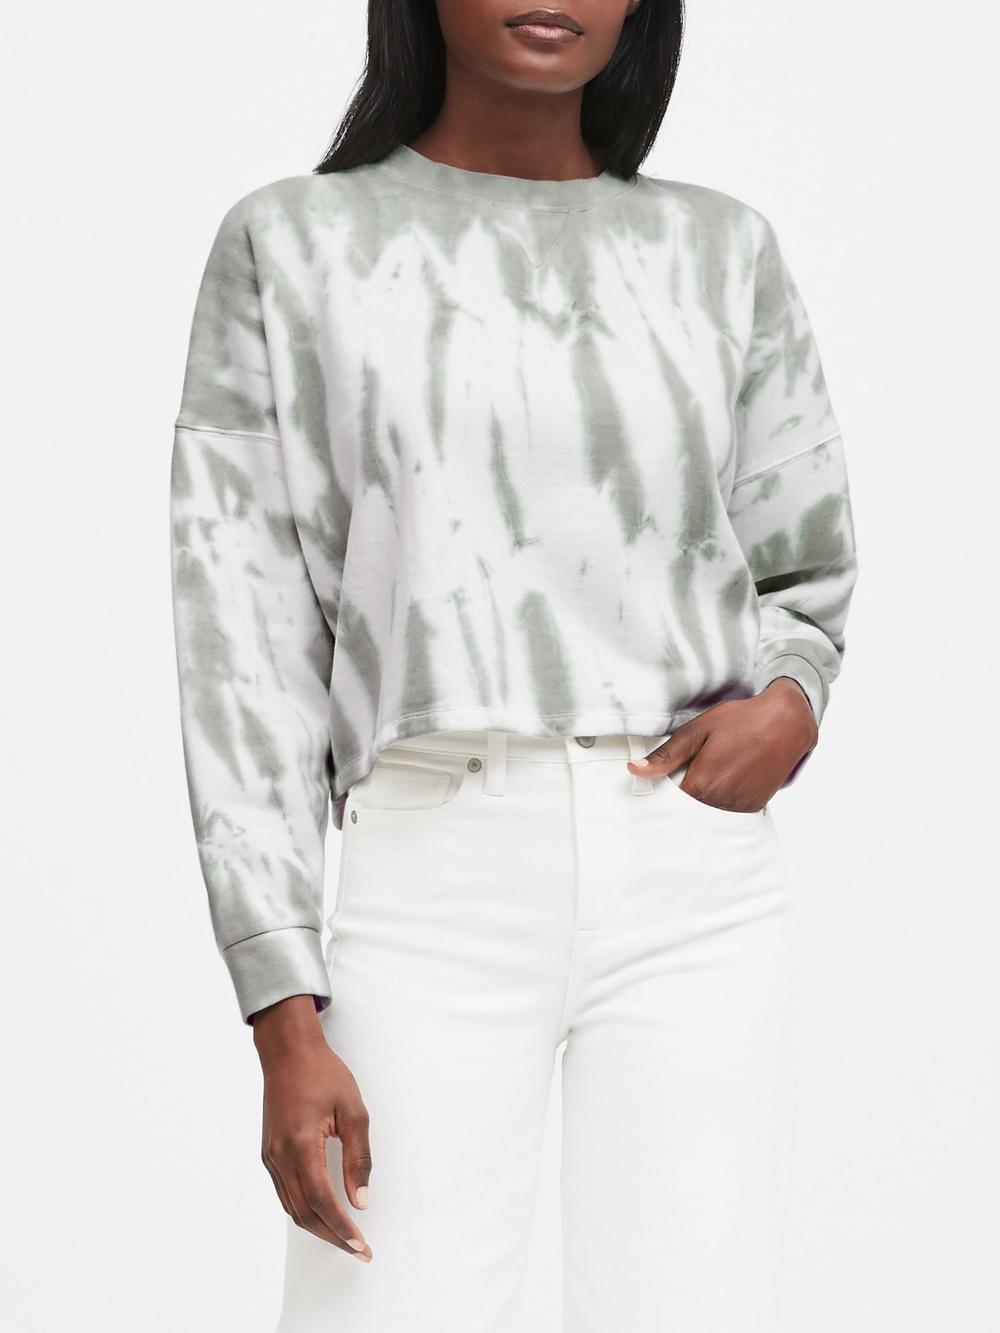 Cropped Tie Dye Sweatshirt Banana Republic Dolman Sleeve Sweatshirt Sweatshirts Tie Dye Sweatshirt [ 1333 x 1000 Pixel ]